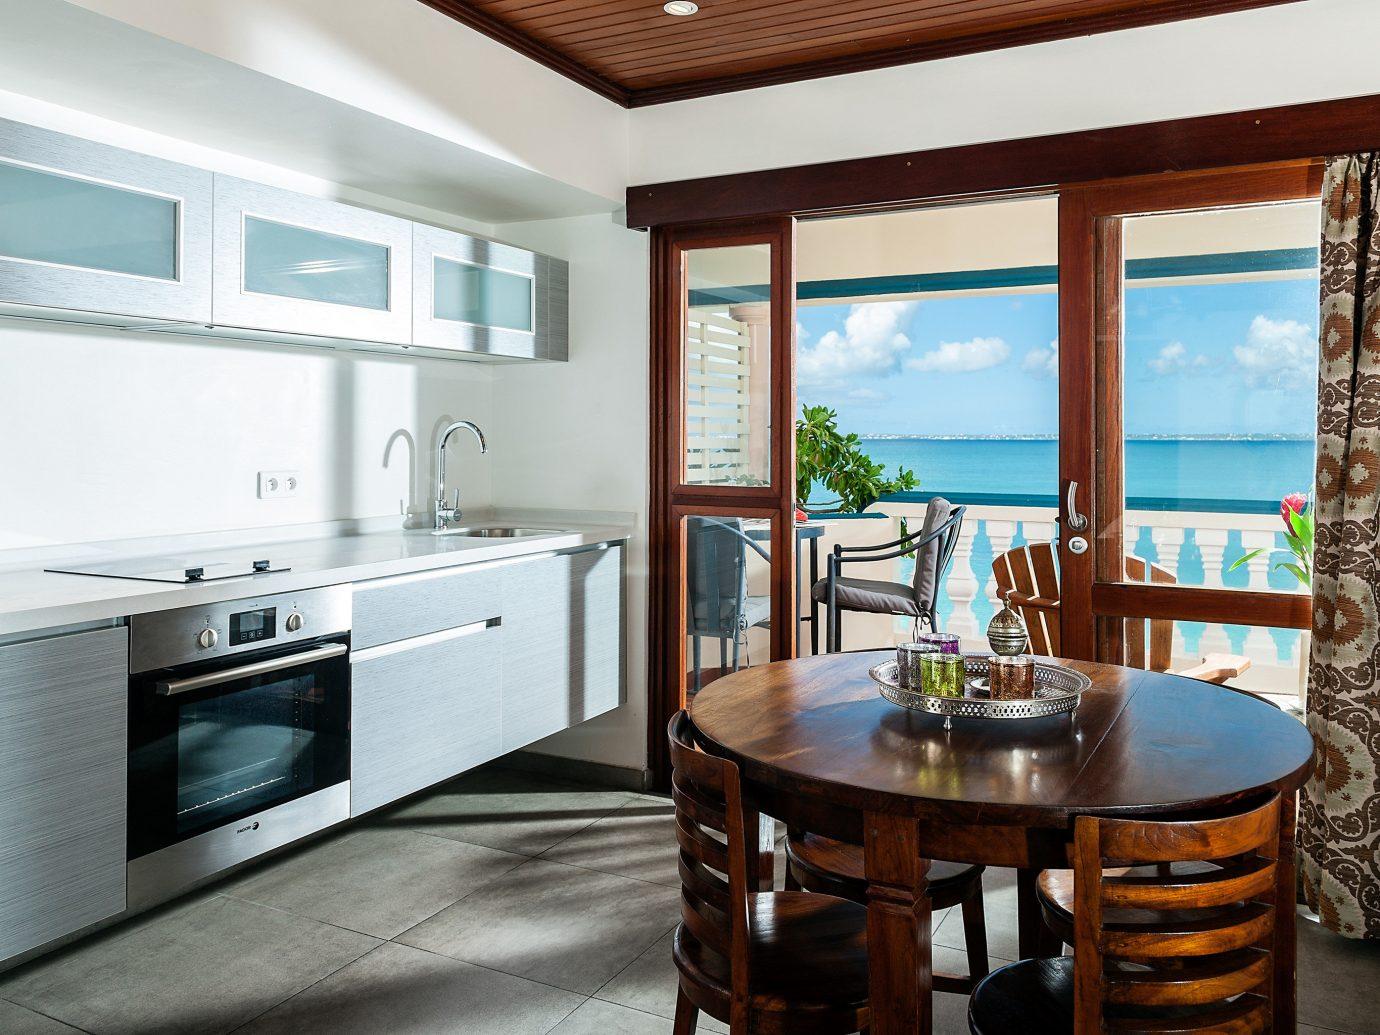 Hotels indoor floor window interior design Kitchen ceiling real estate countertop interior designer cuisine classique furniture wood Island